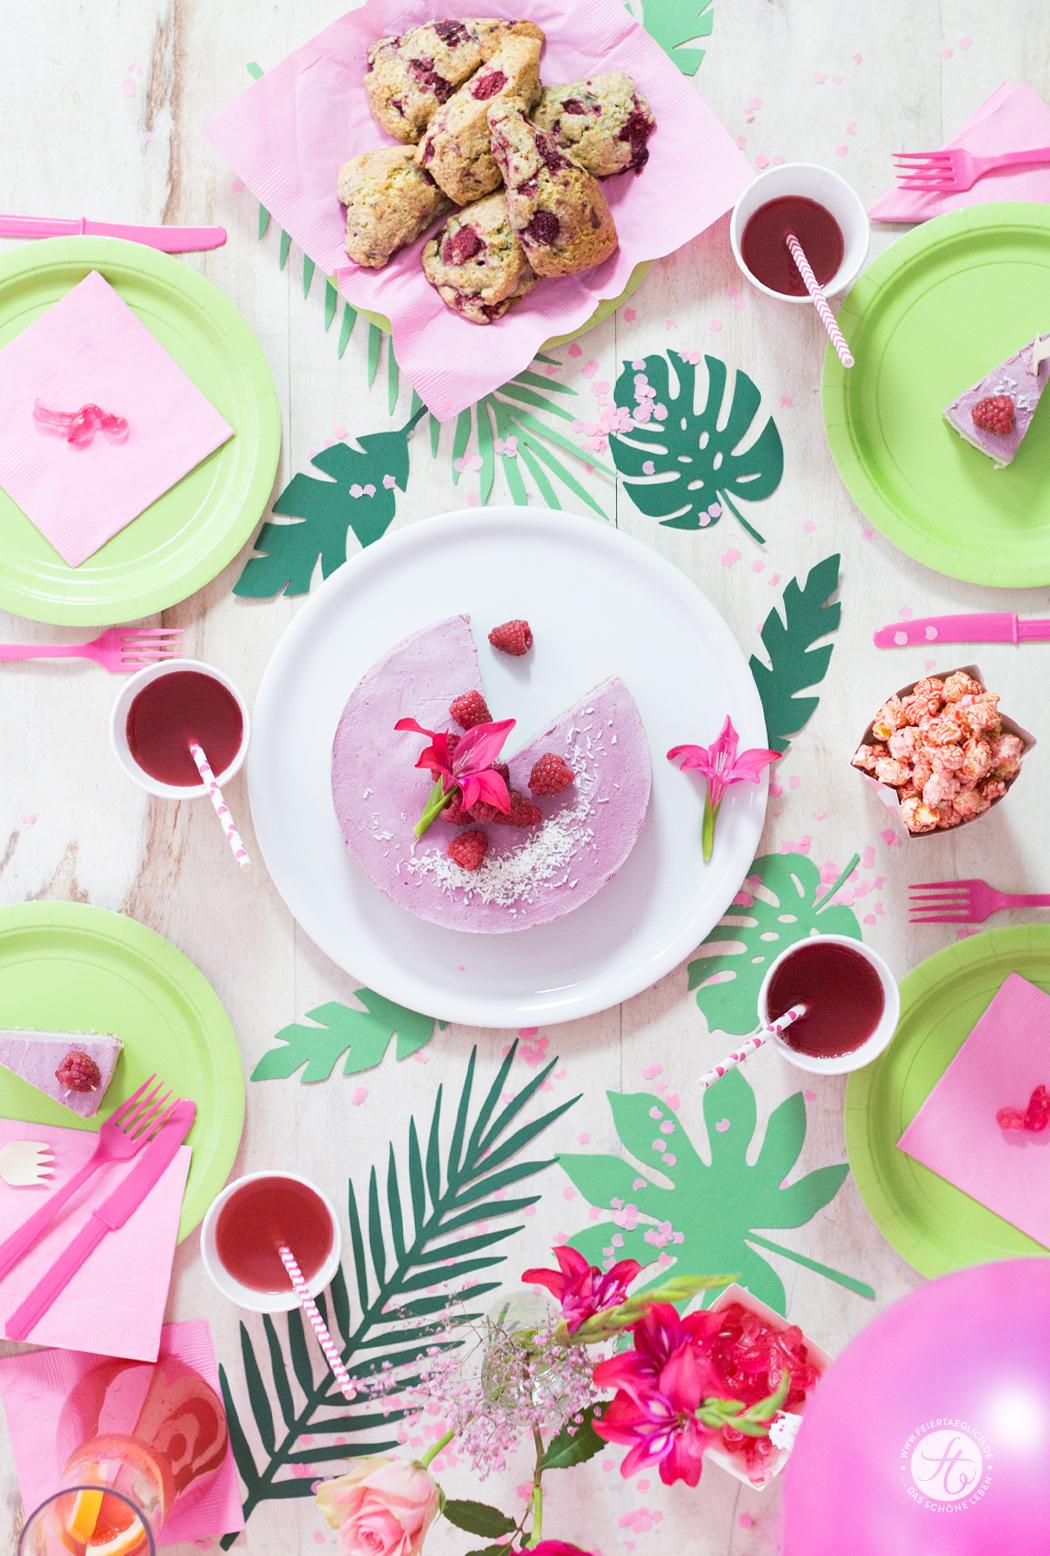 HappyMottoparty Flamingo, Tischdekoration, Rezepte